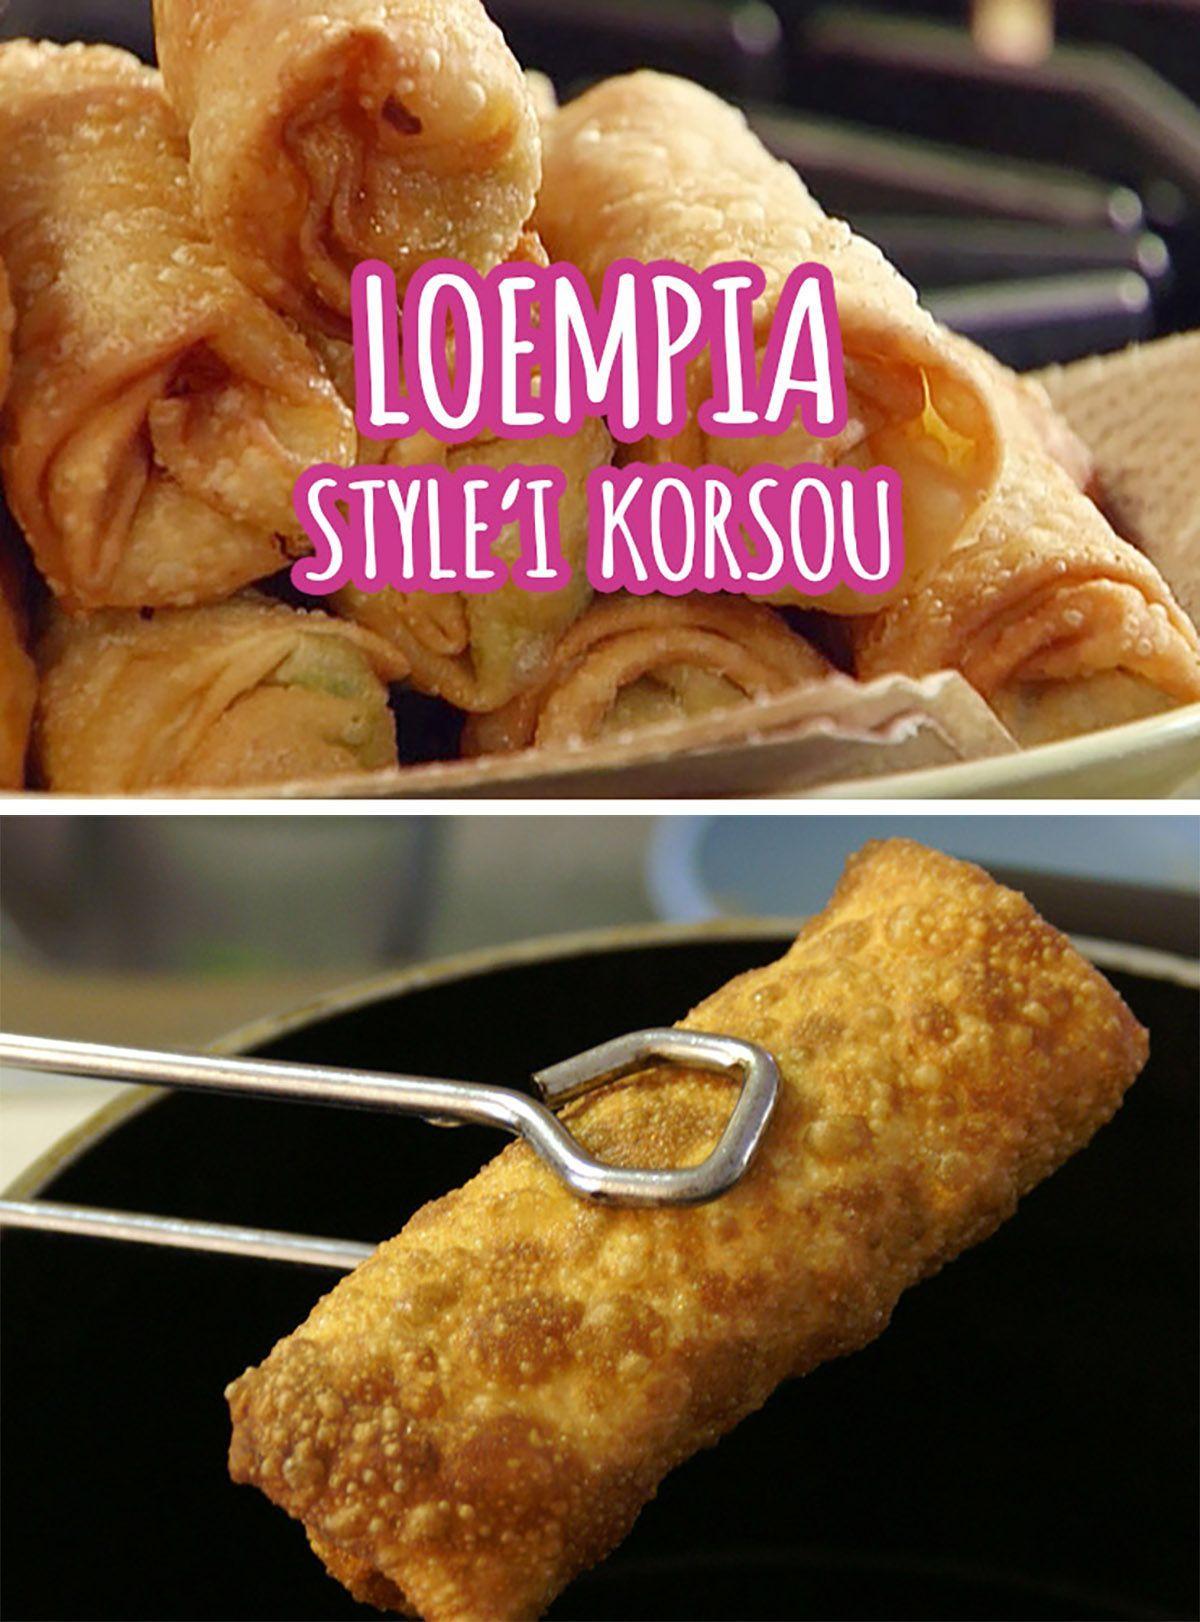 Wonderbaar Antilliaanse loempia's - Lumpia style'i Korsou - recept | Recept VC-97